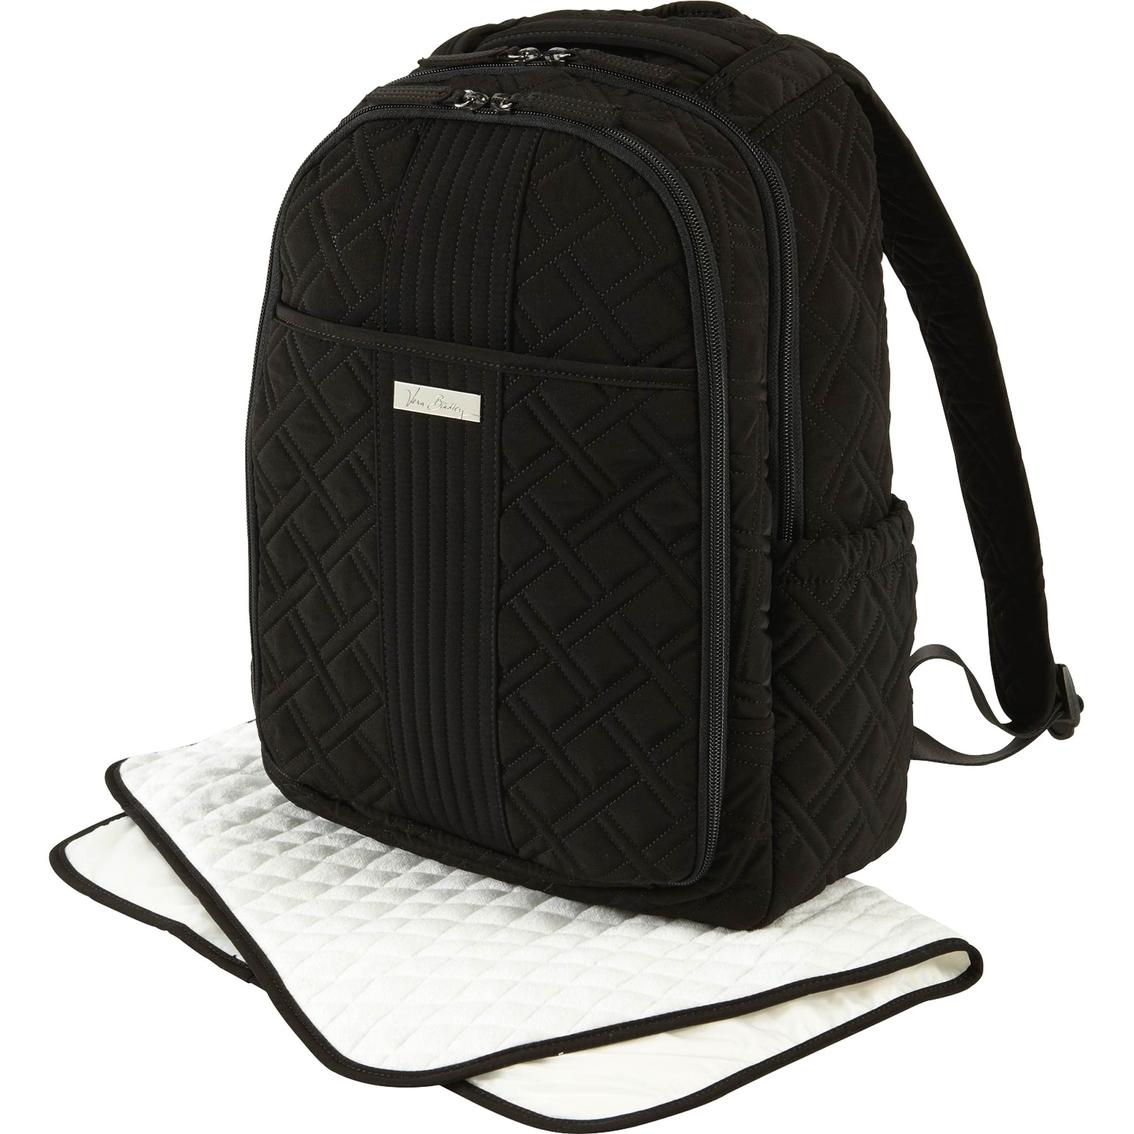 Vera Bradley Backpack Baby Bag Classic Black